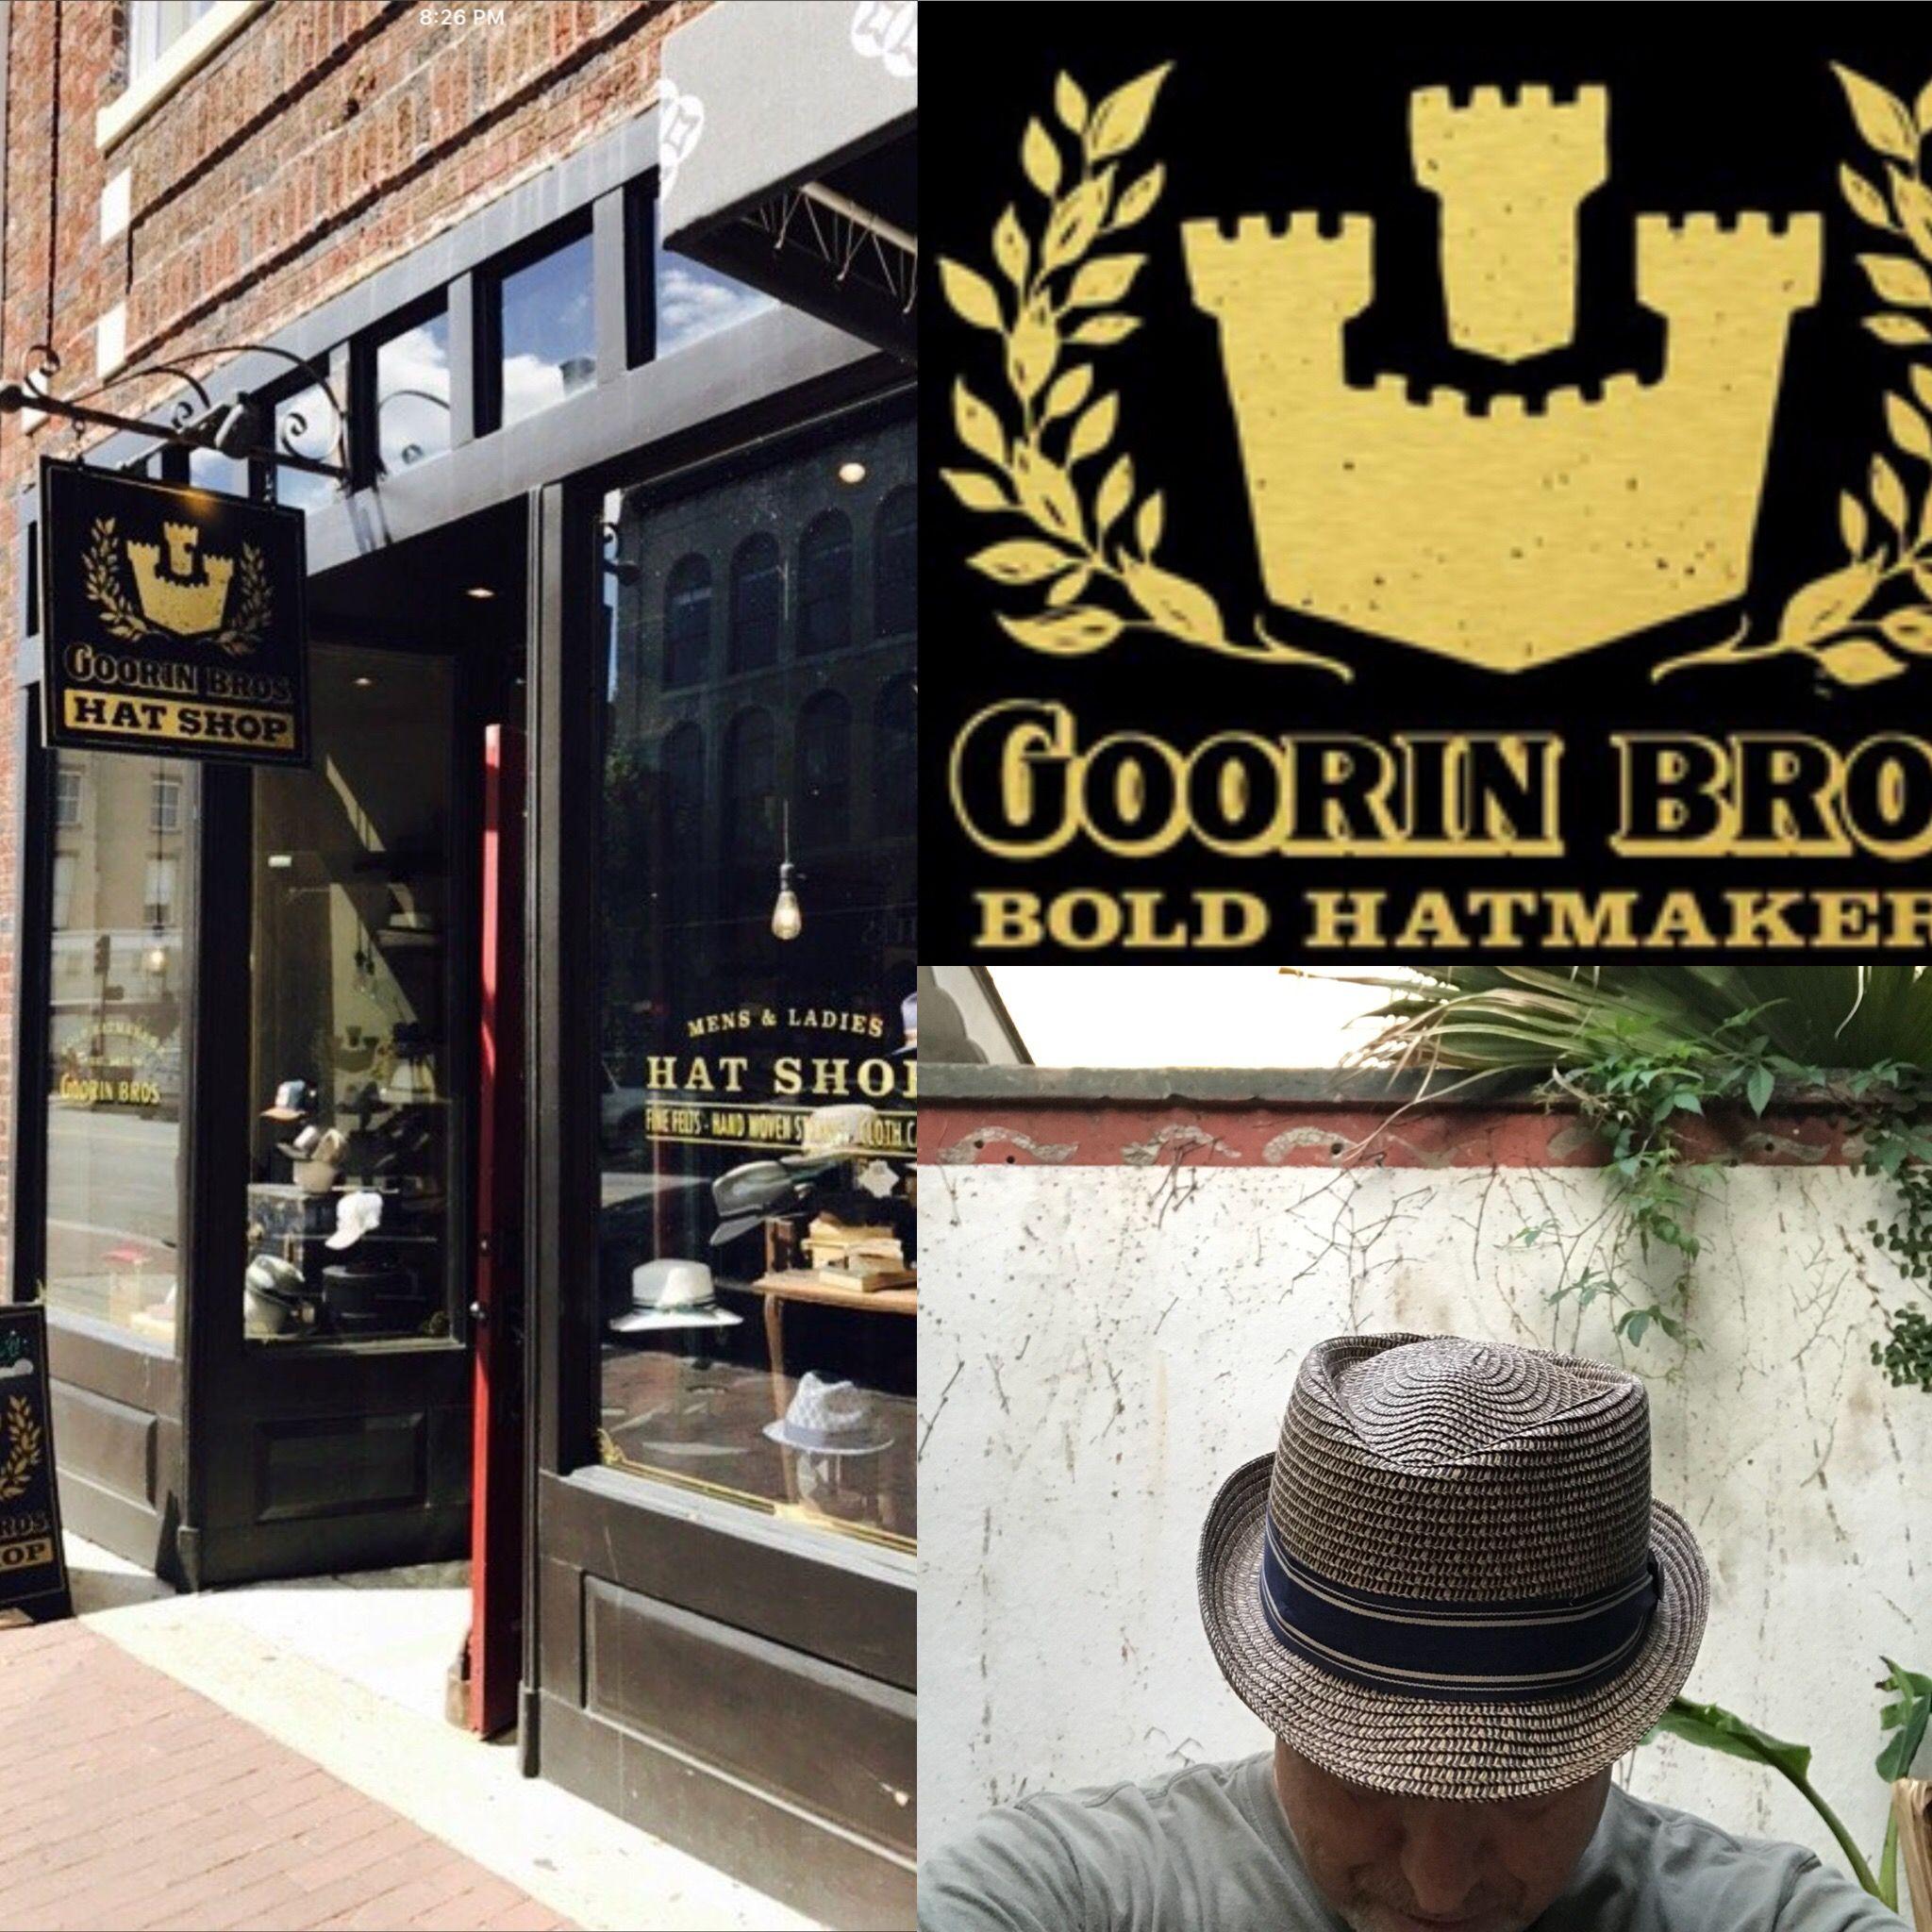 Goorin Bros Hat Shop Savannah Savannah Chat Hat Shop Goorin